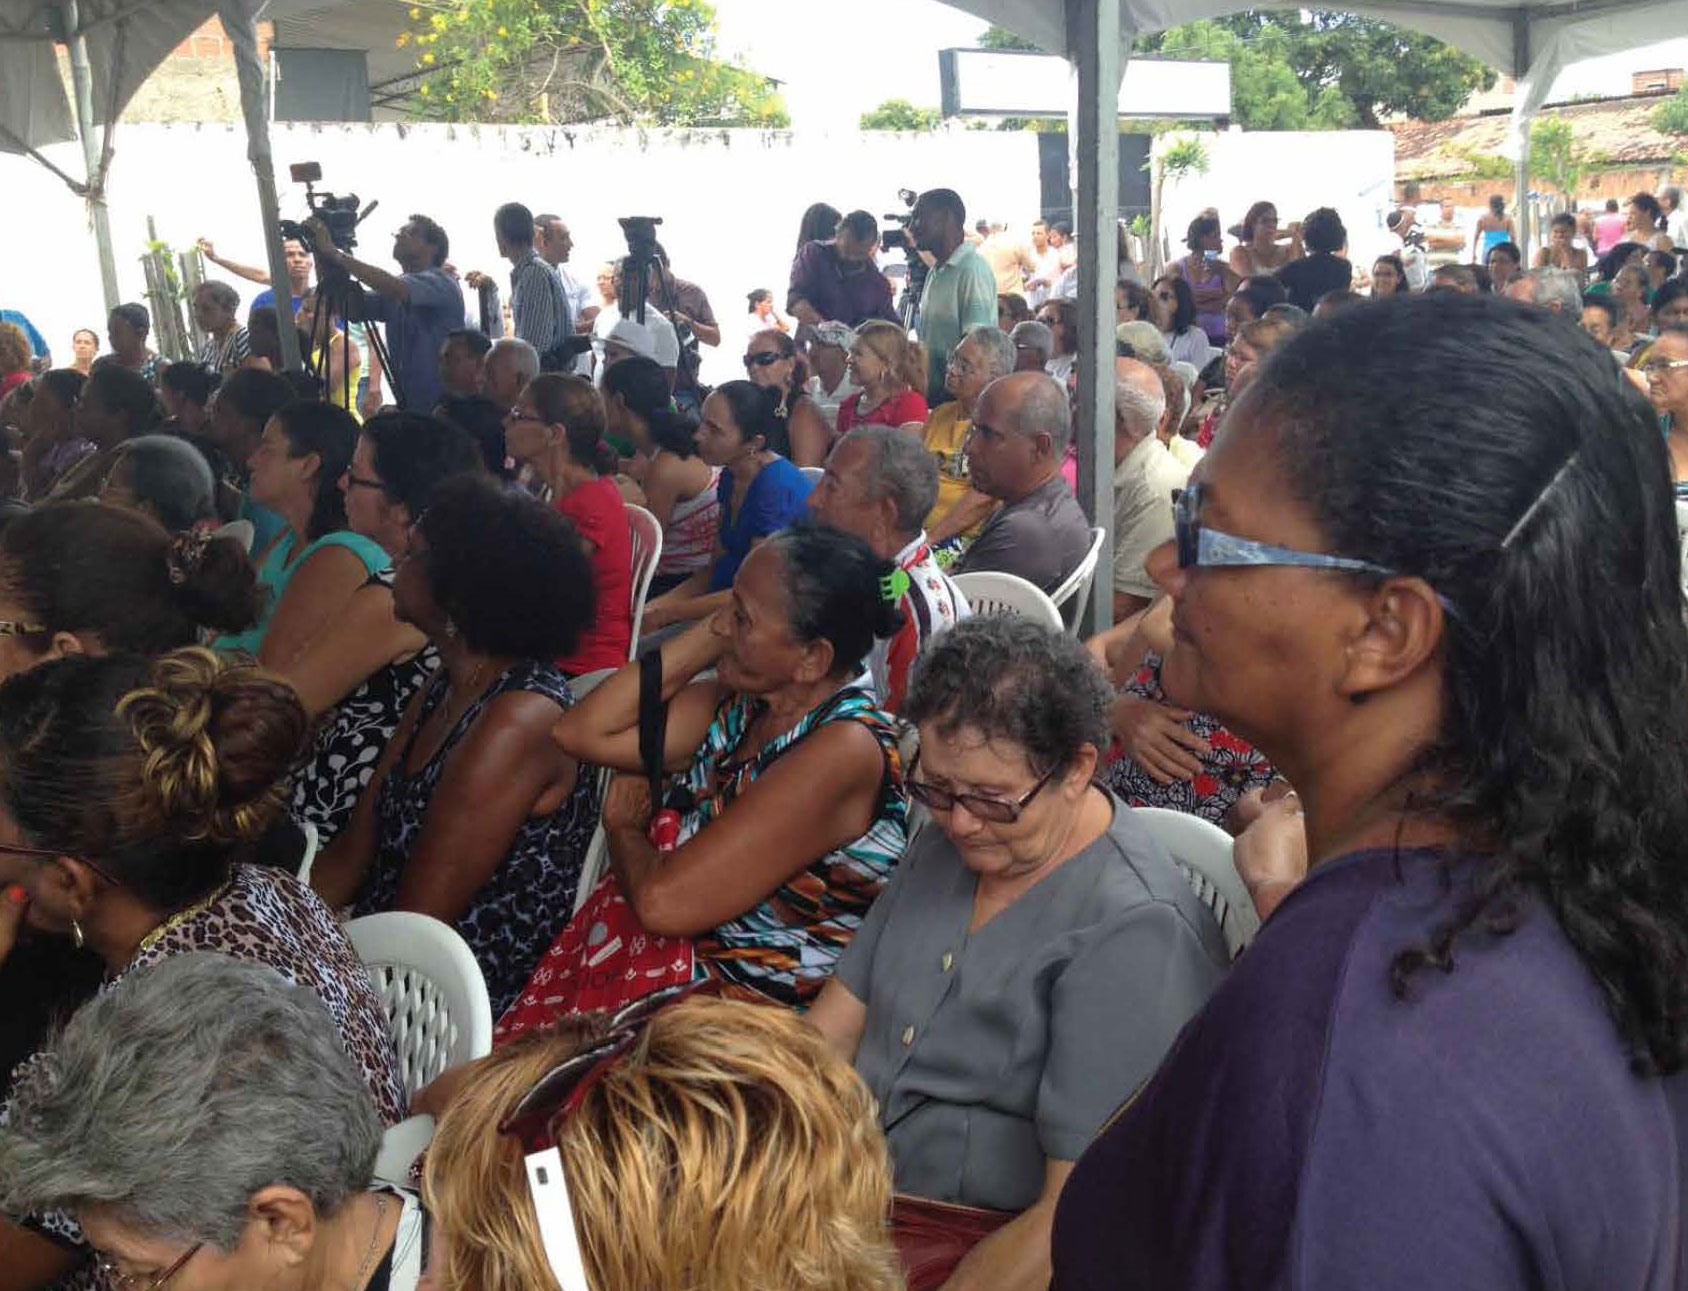 Women in Ponto do Maduro, Brazil